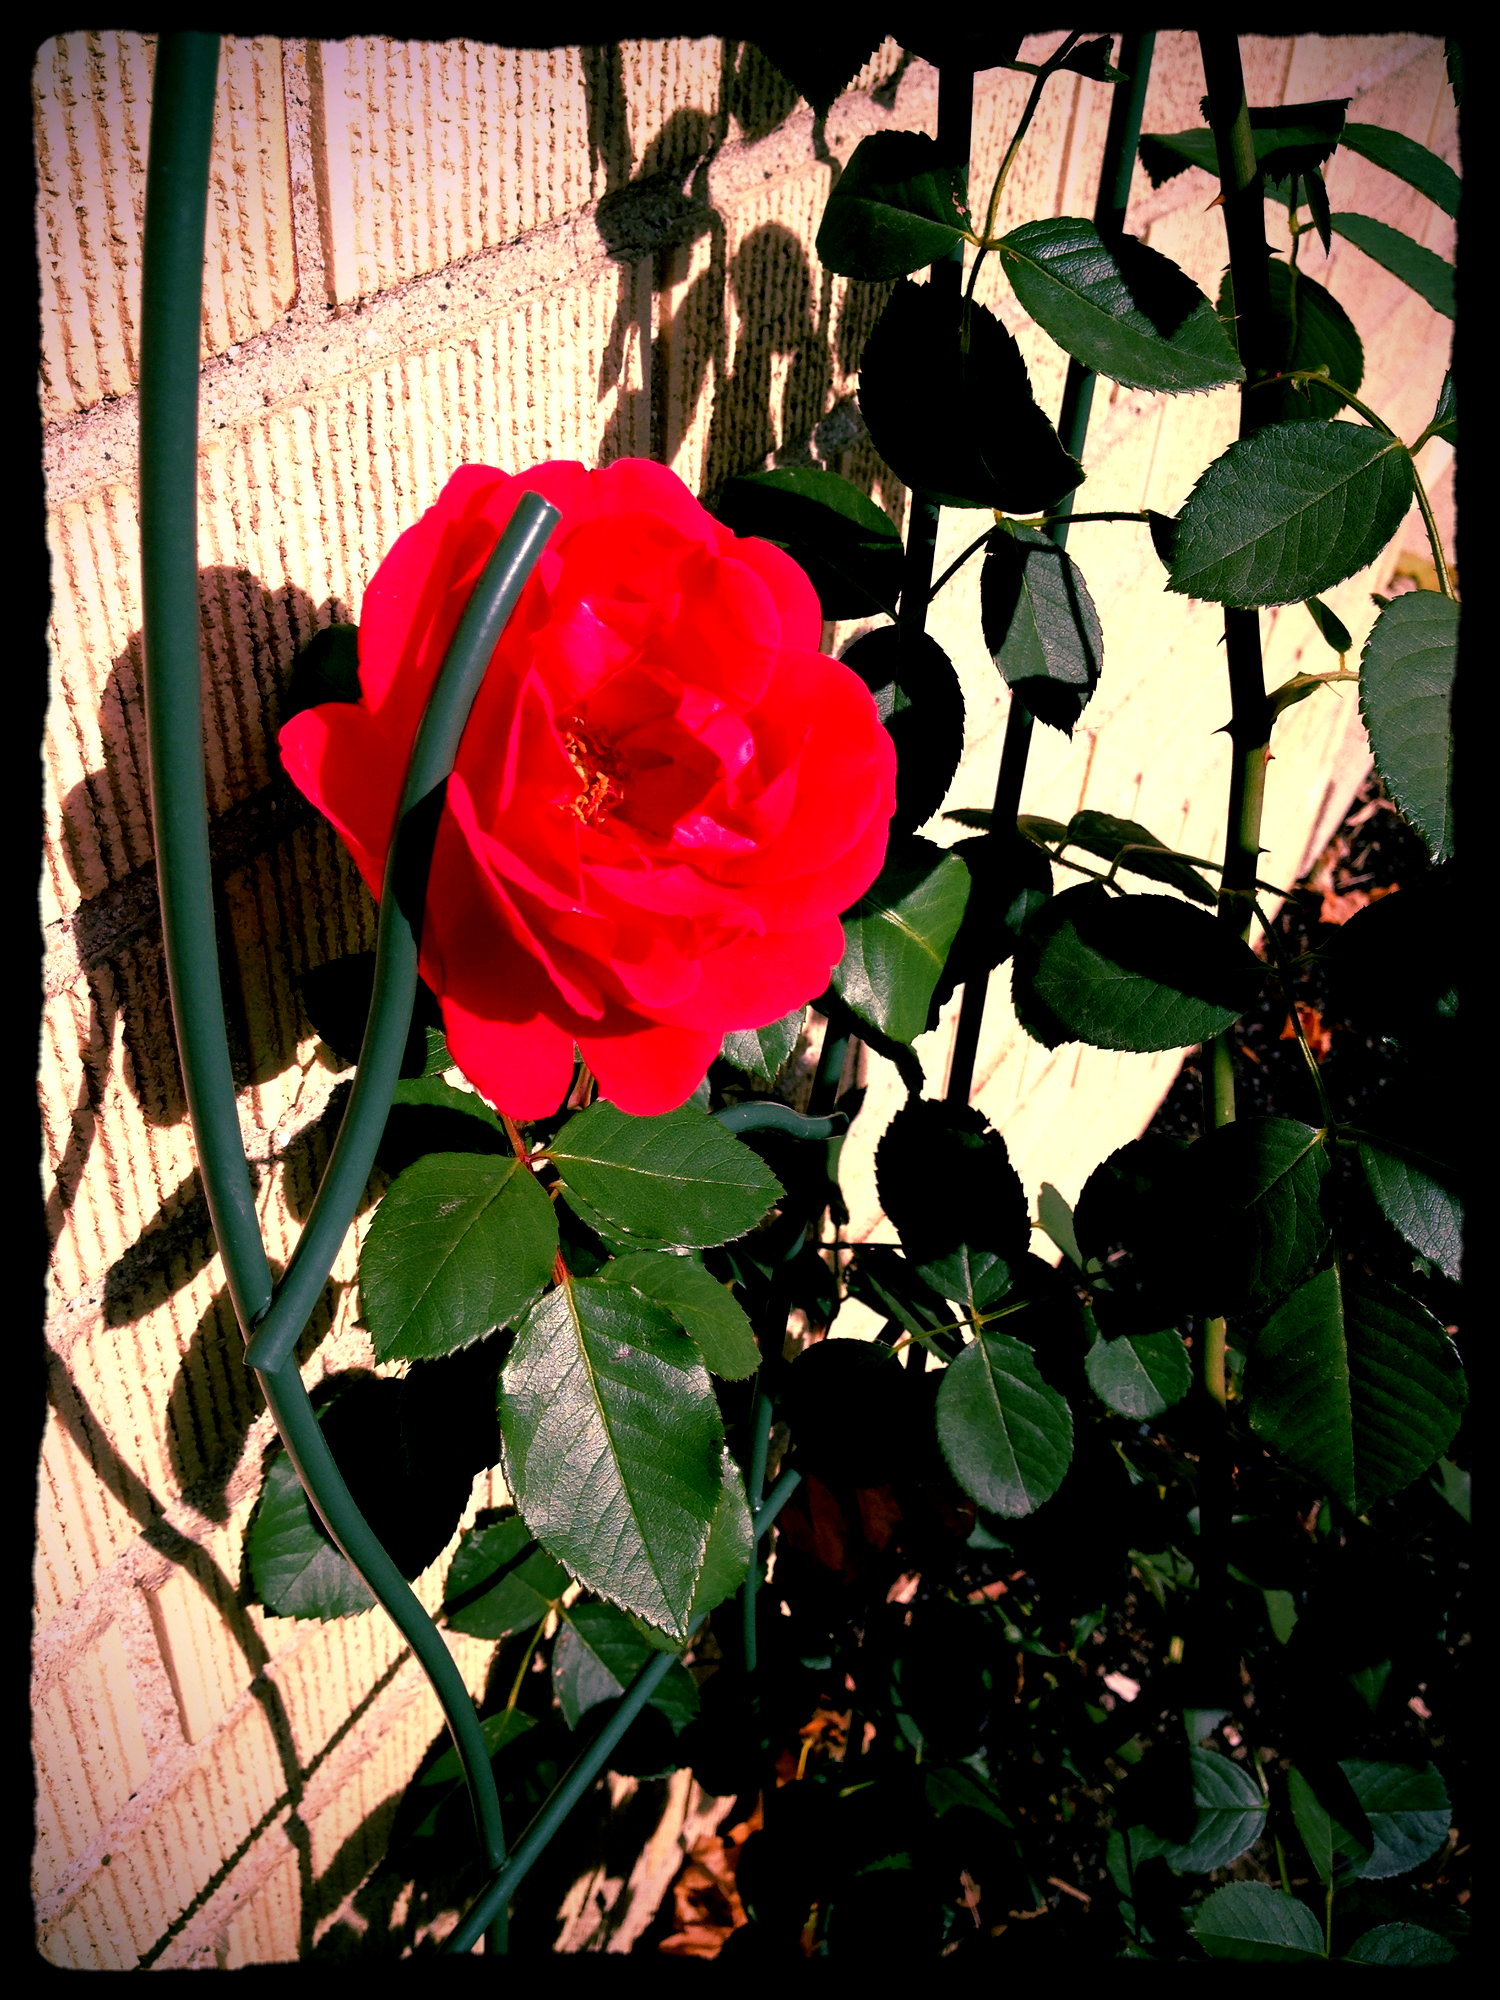 final rose of the season